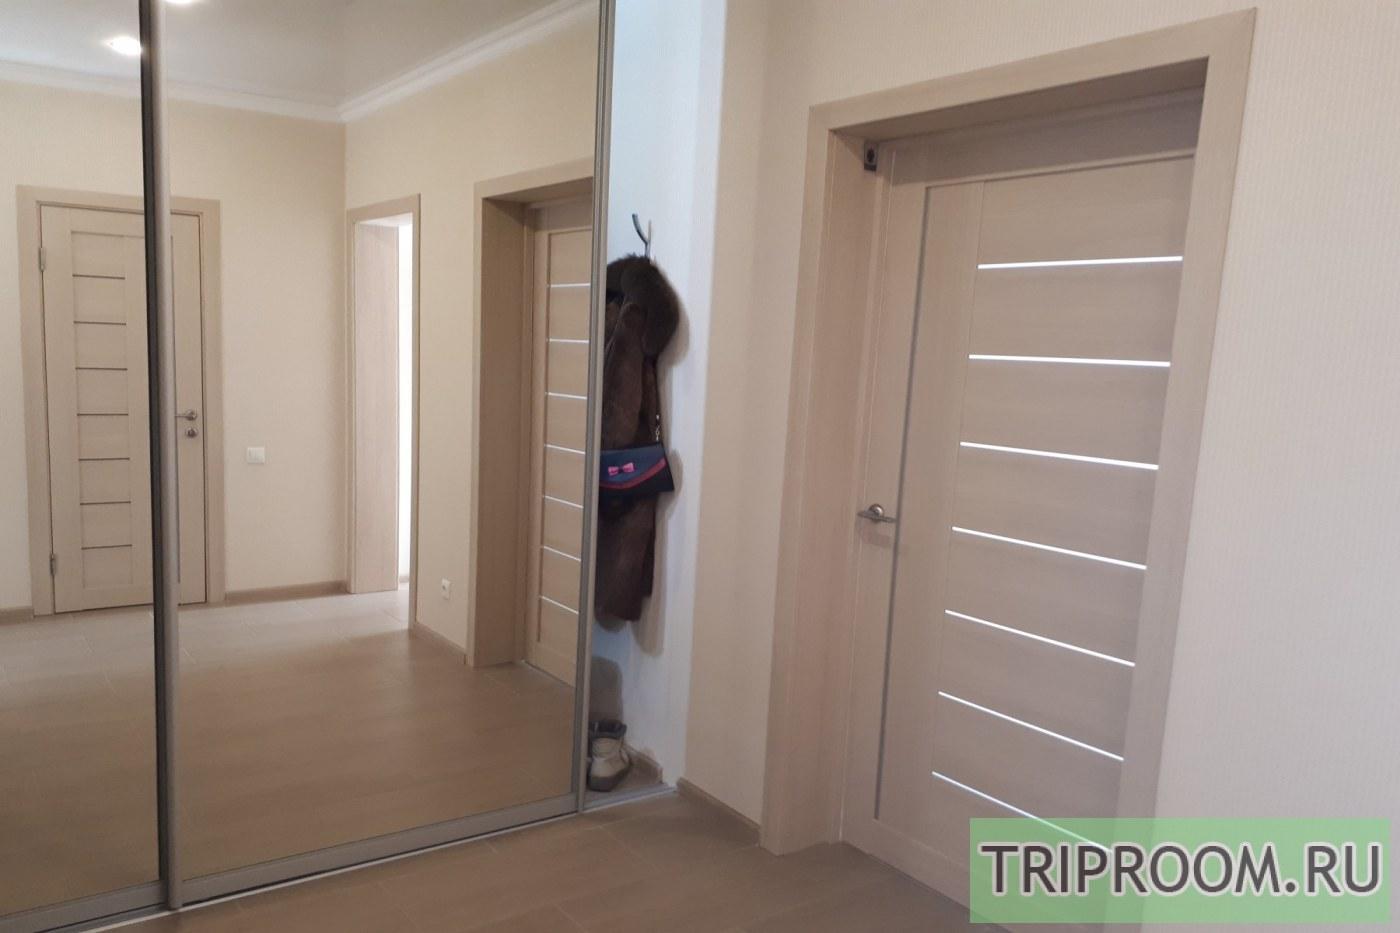 1-комнатная квартира посуточно (вариант № 39060), ул. Симиренко улица, фото № 14